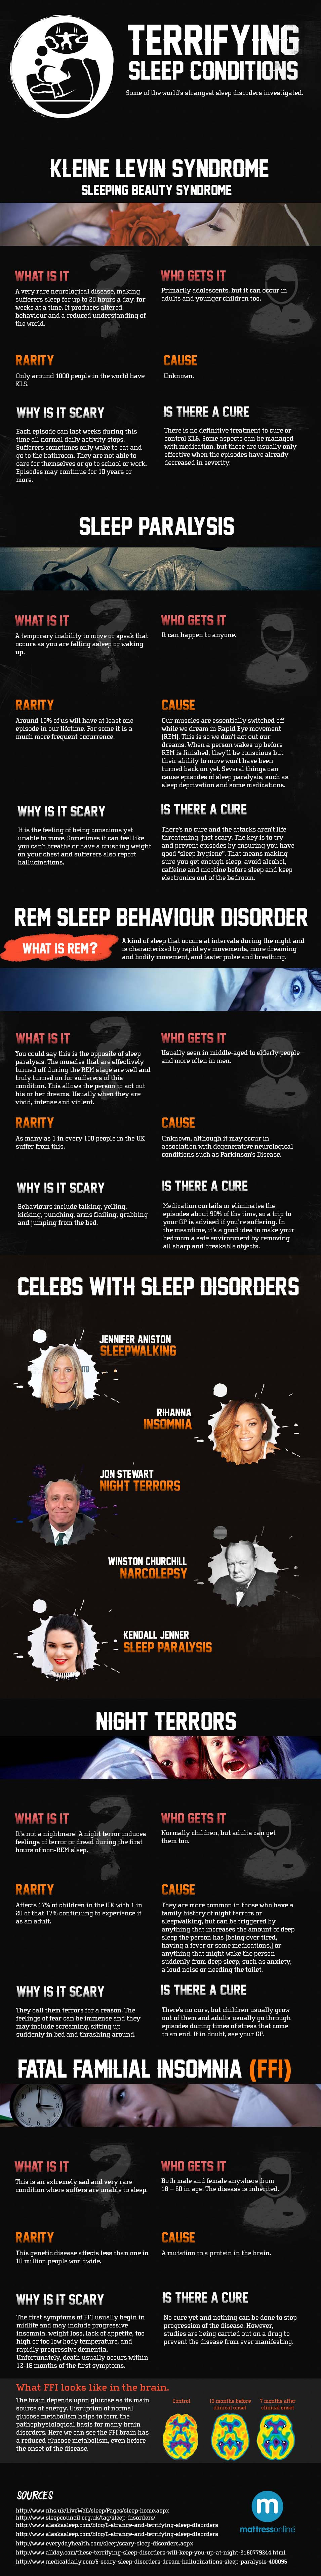 Terrifying Sleep Conditions